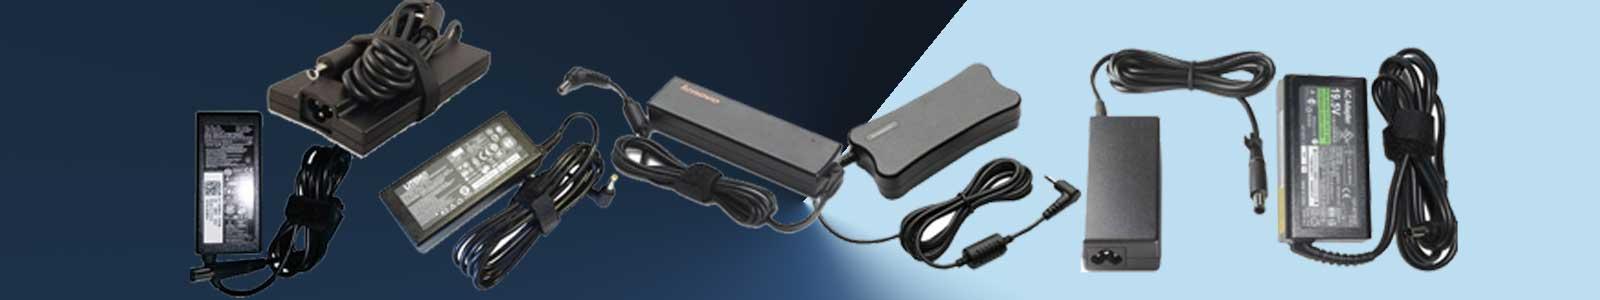 خرید شارژر لپ تاپ